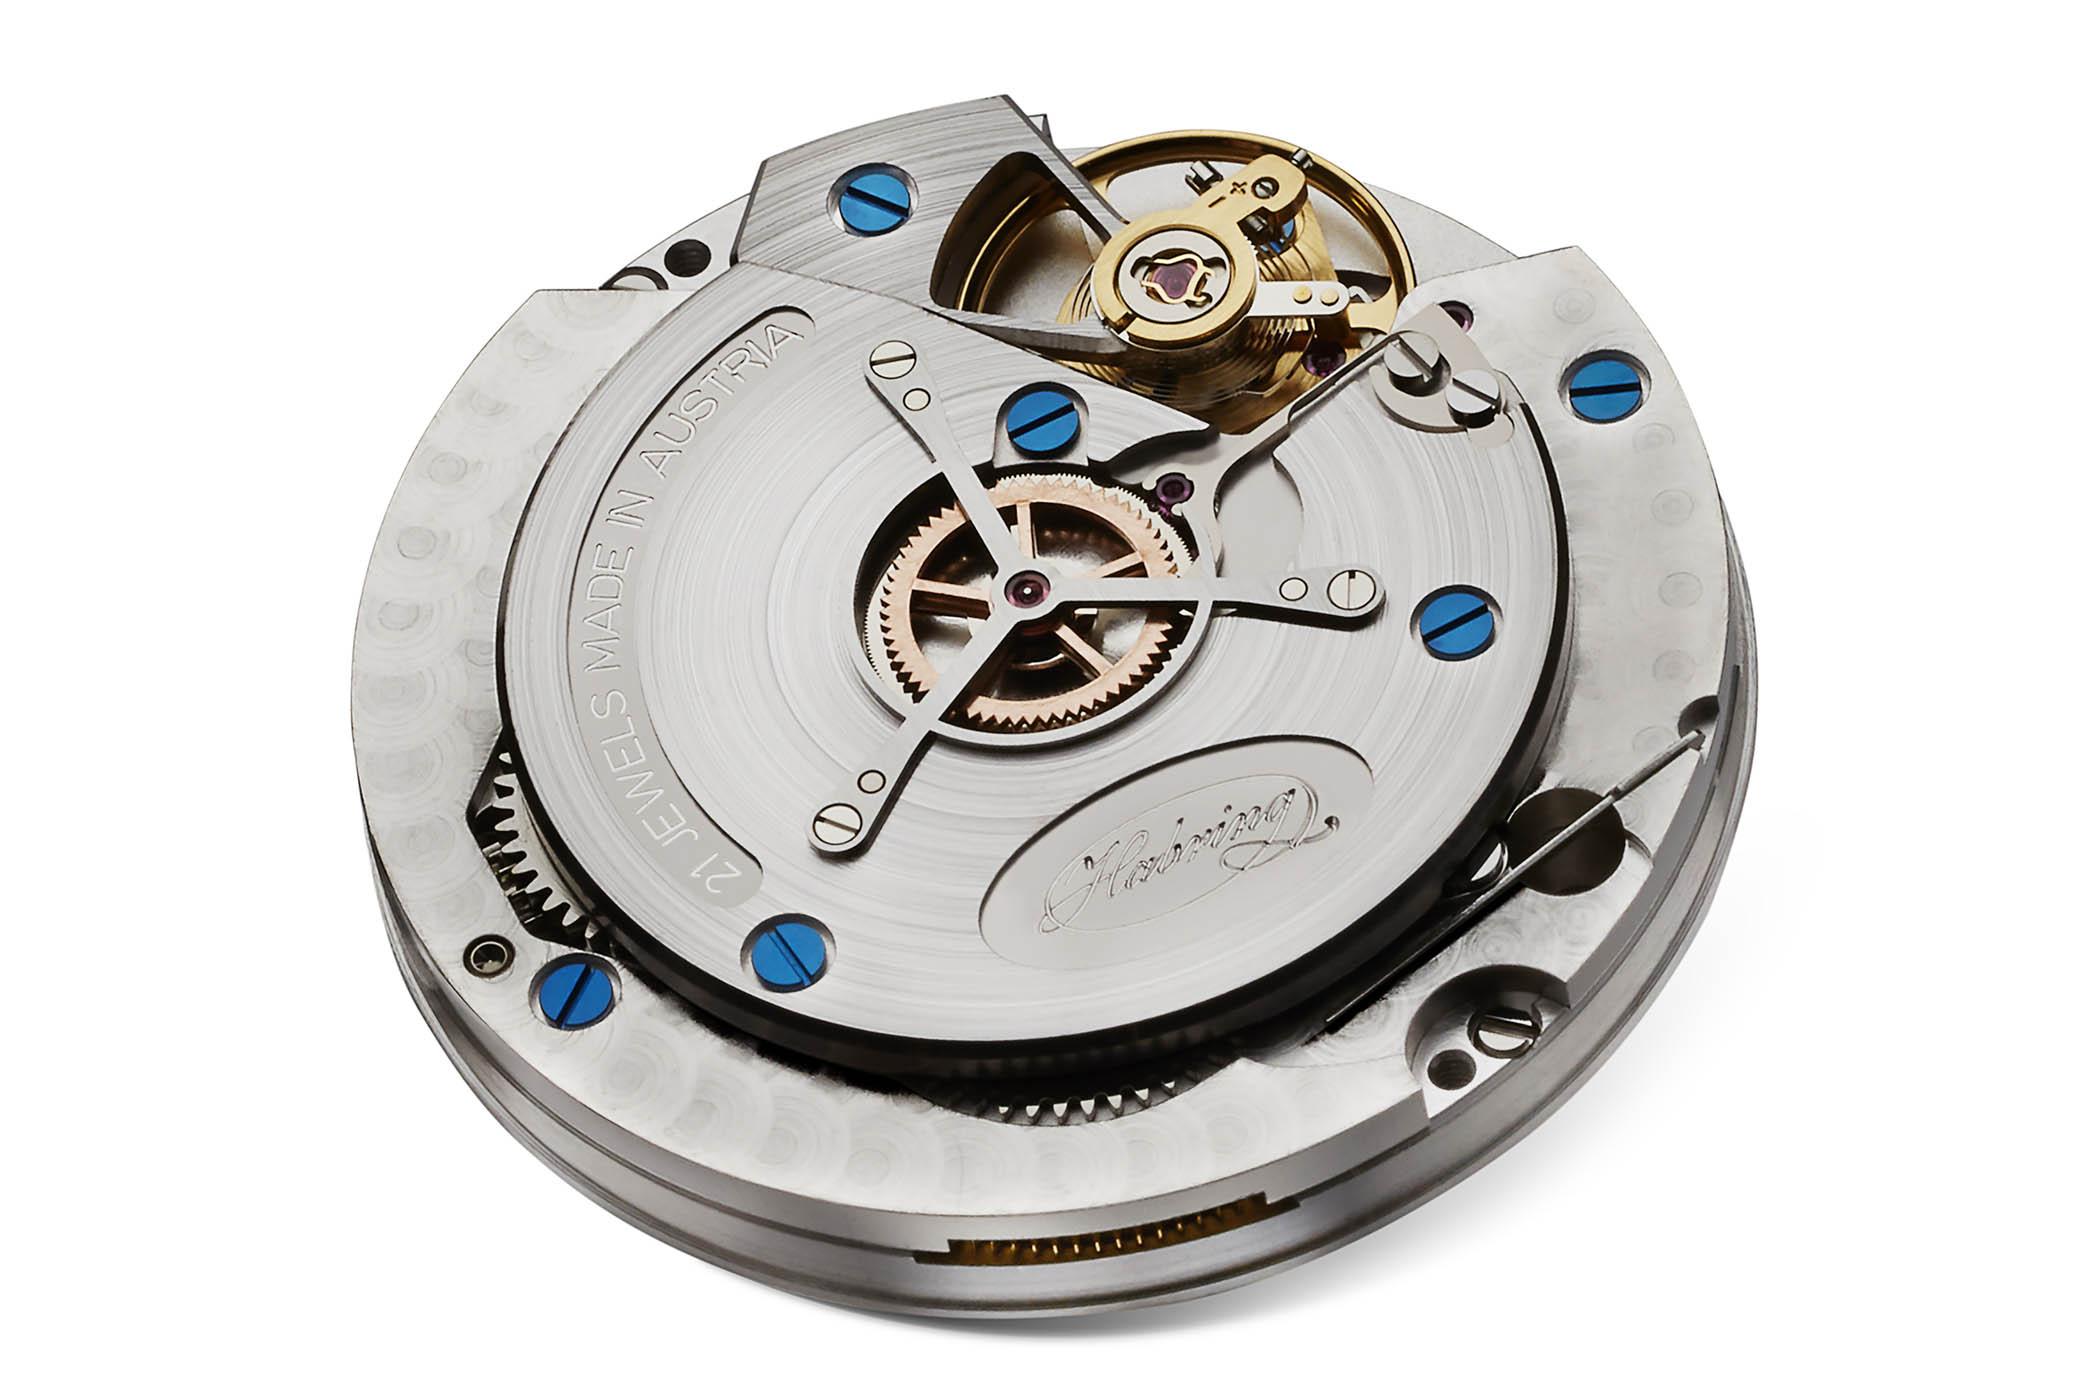 Habring2 Erwin LAB01 Massena Bronze sector dial deadbeat second - 1